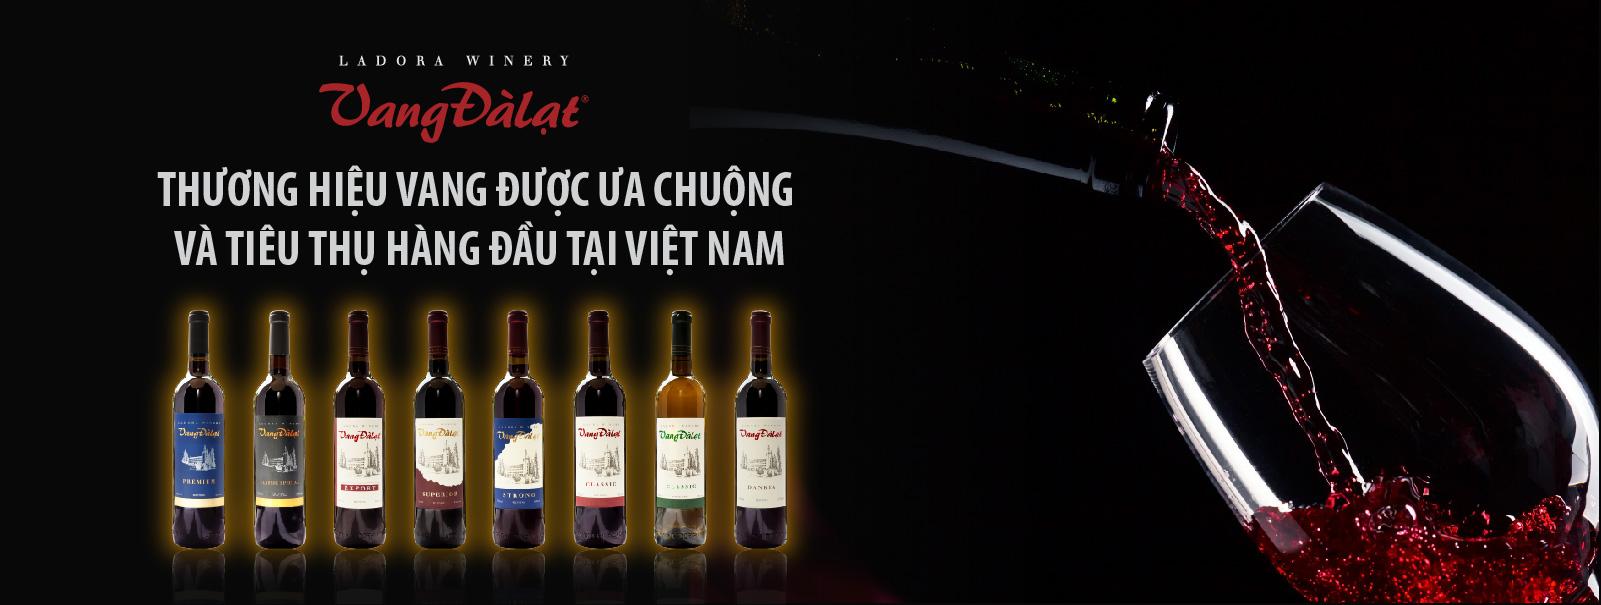 Gioi thieu Vang DaLat 1600x604 px 01-01